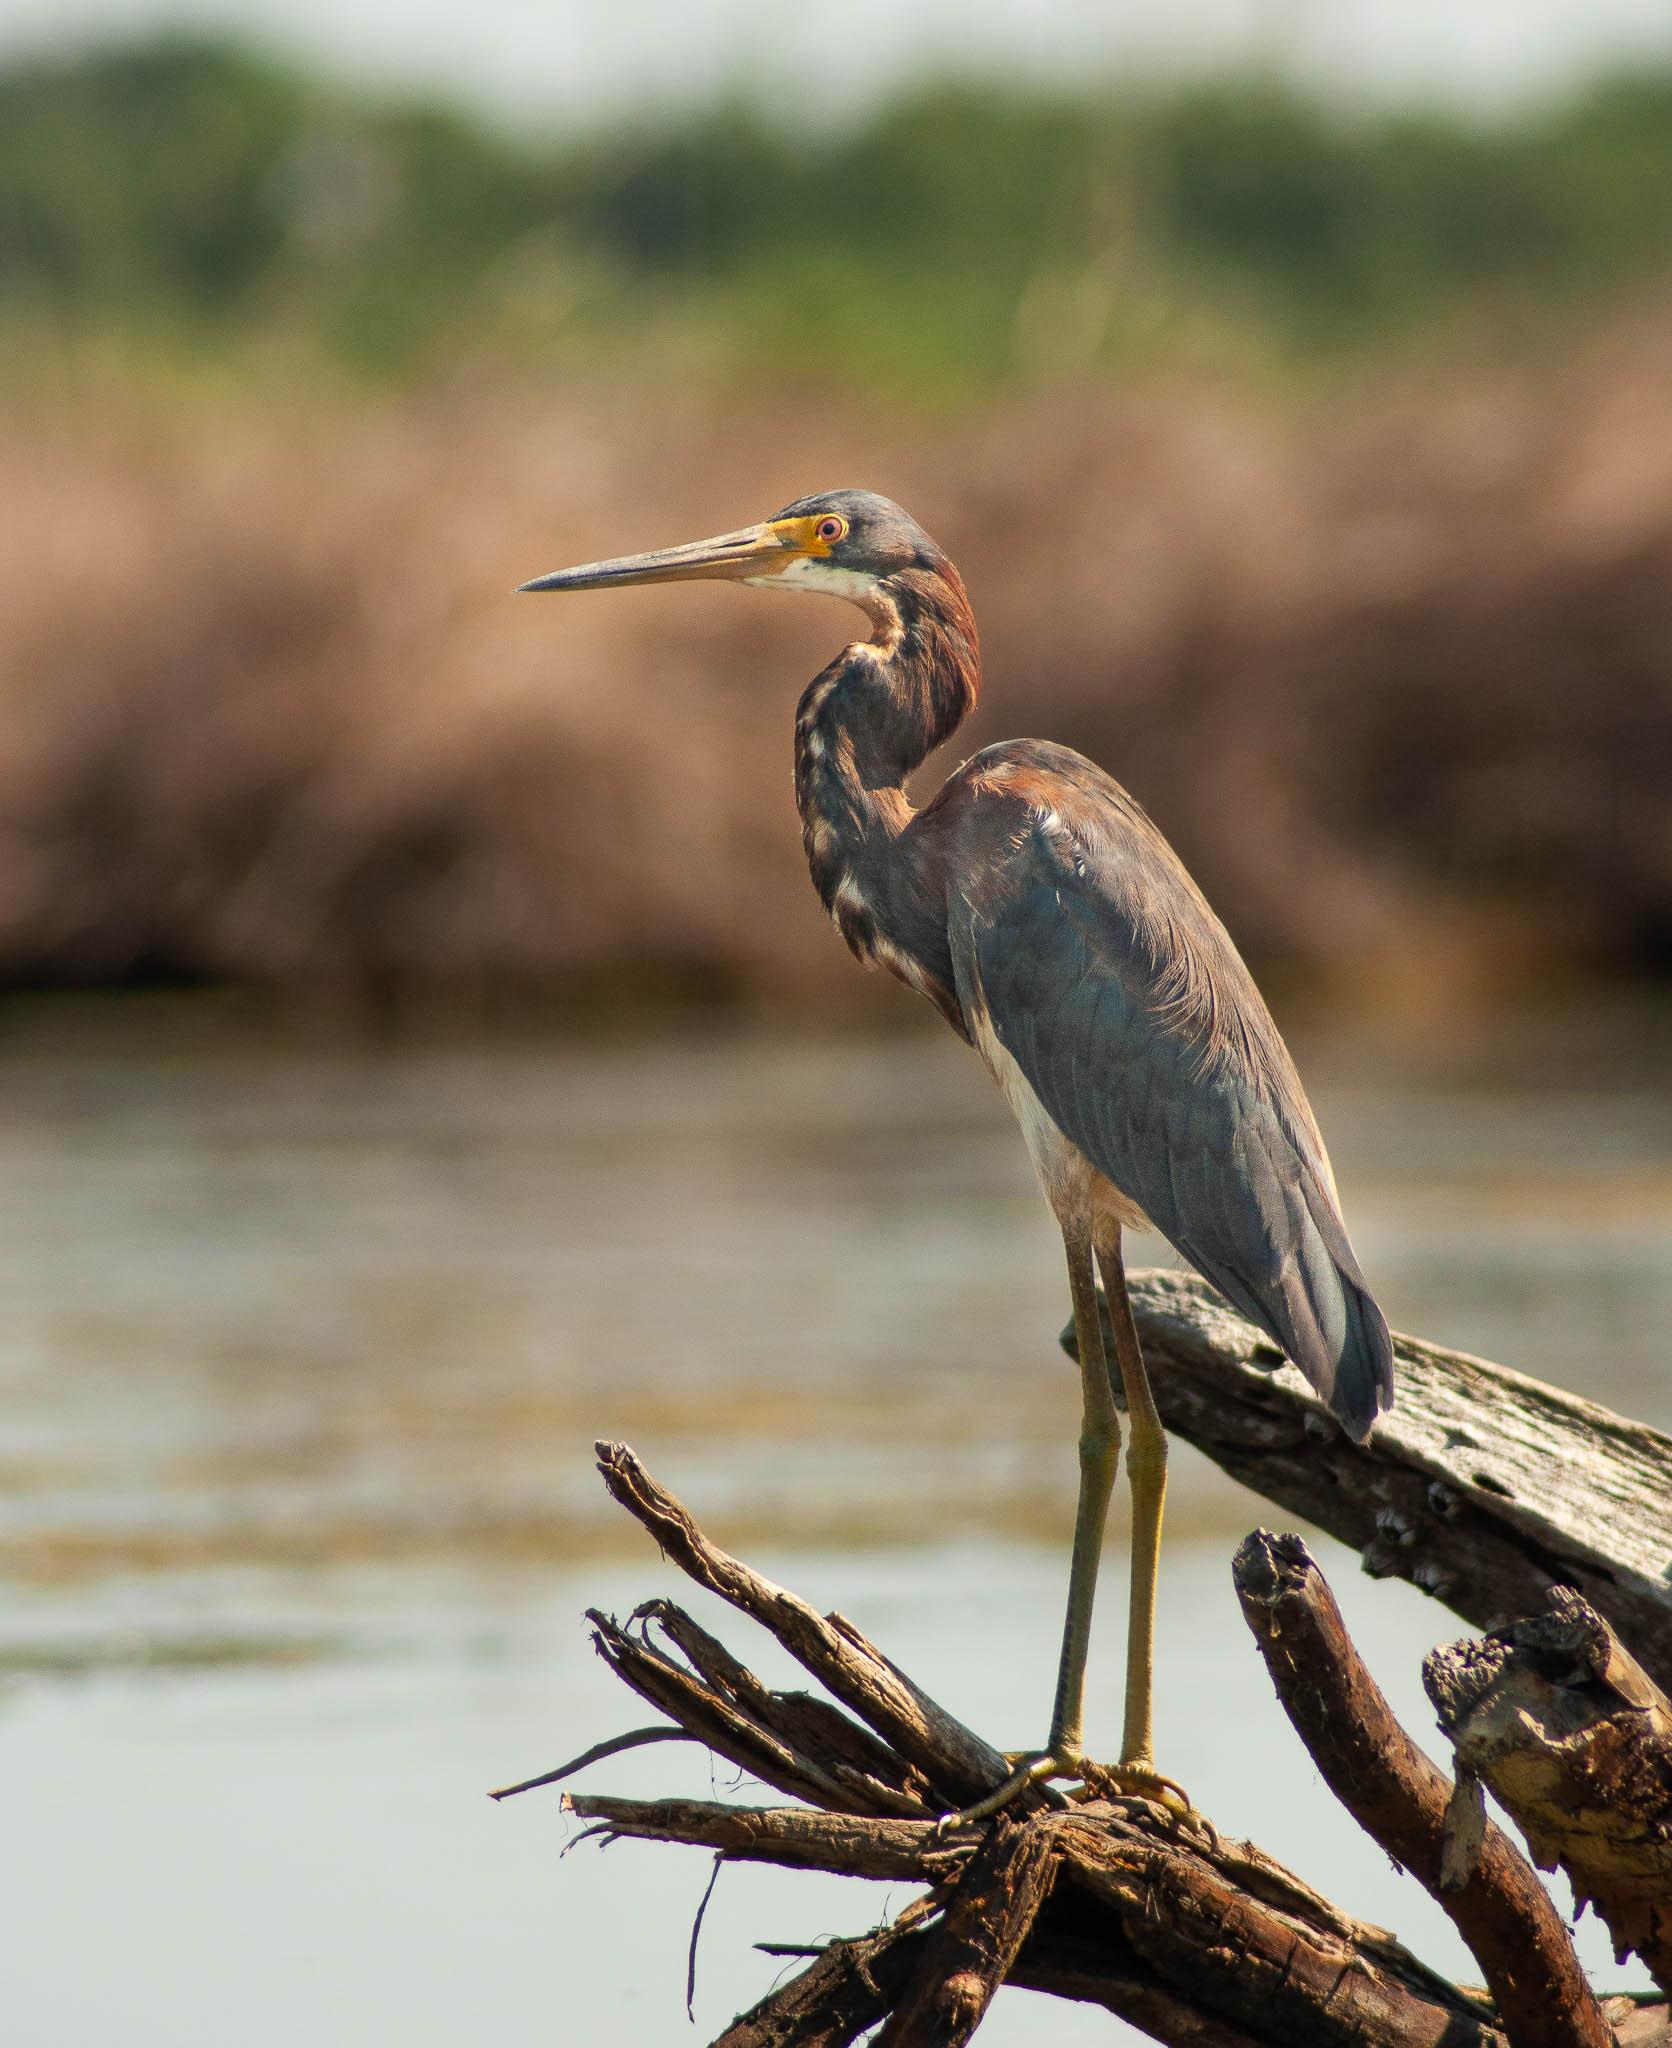 birding louisiana, birding new orleans, birds new orleans, new , new orleans, kayak, kayak tours, kayak swamp tours, kayaking new orleans, new orleans kayak tours